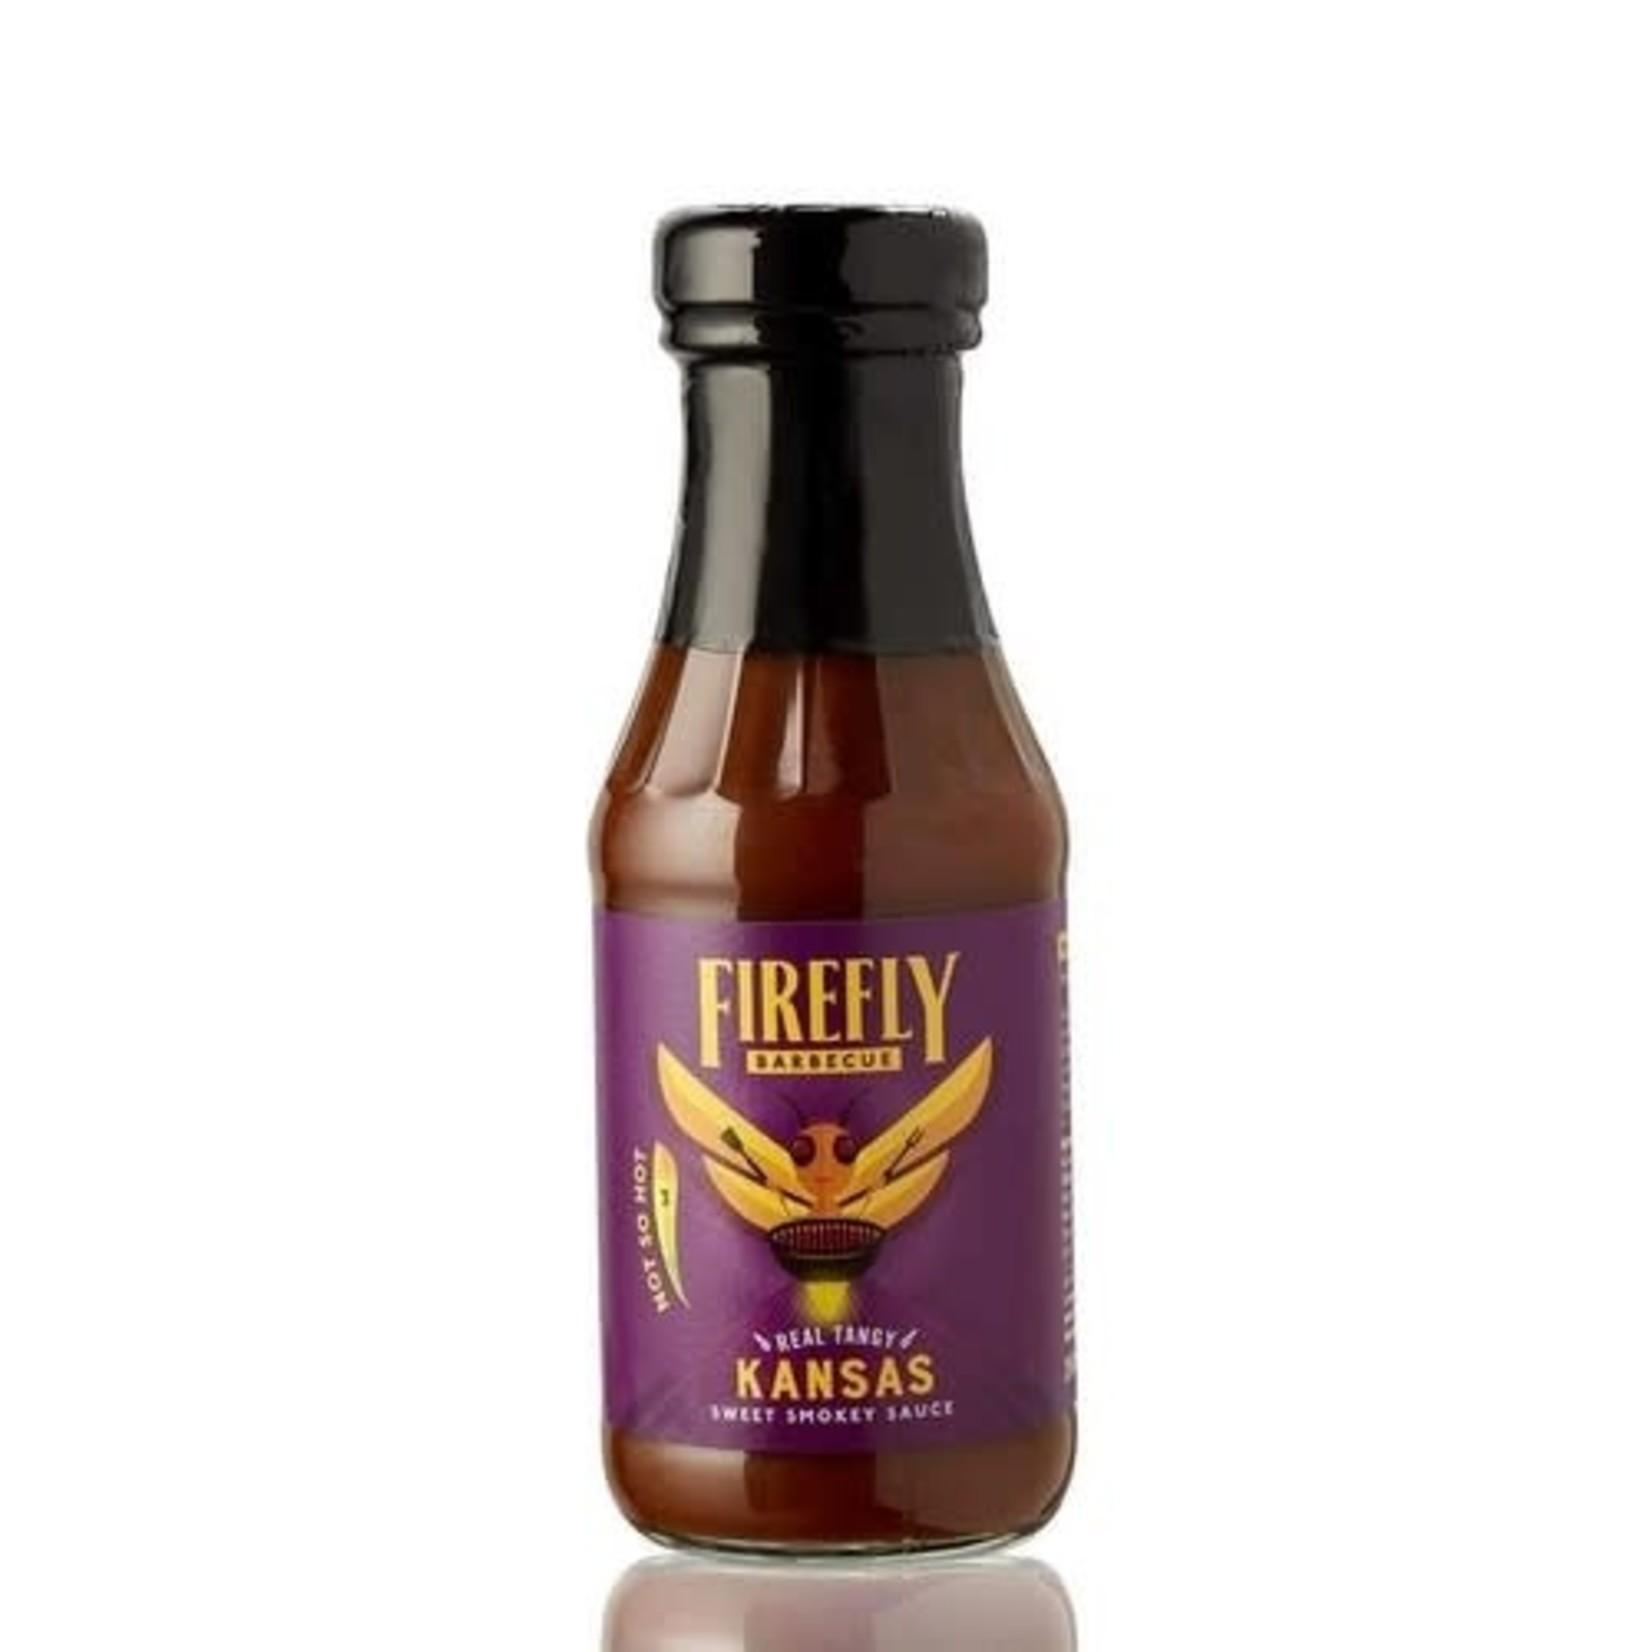 Firefly Firefly Kansas Briket BBQ Sauce 268ml